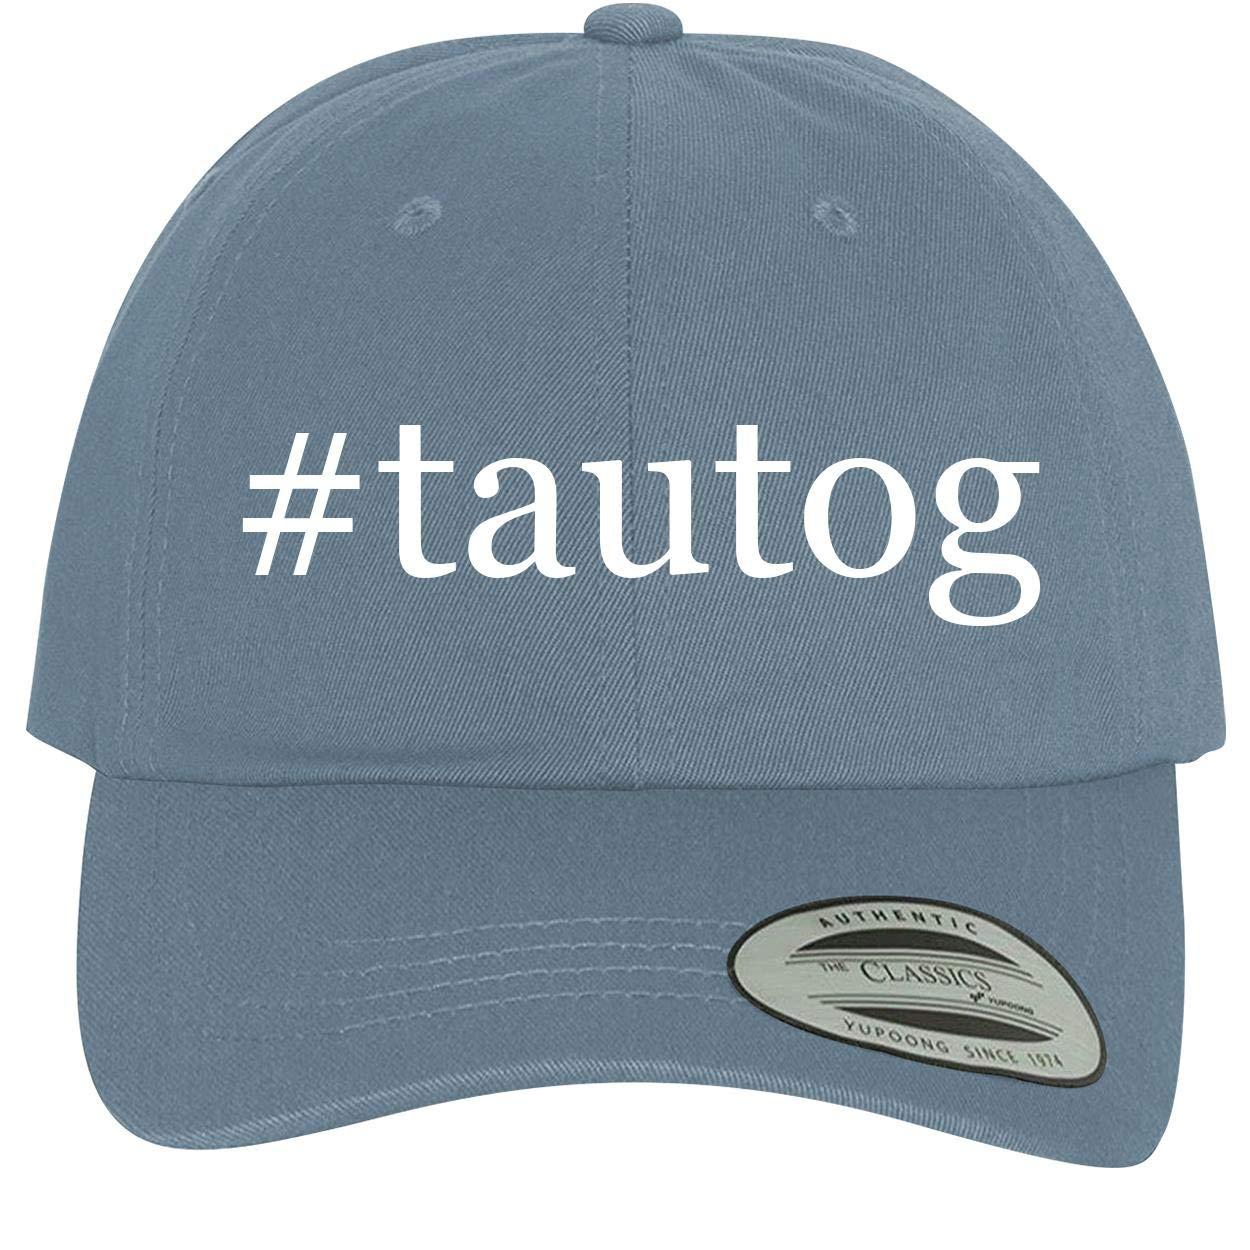 Comfortable Dad Hat Baseball Cap BH Cool Designs #Tautog